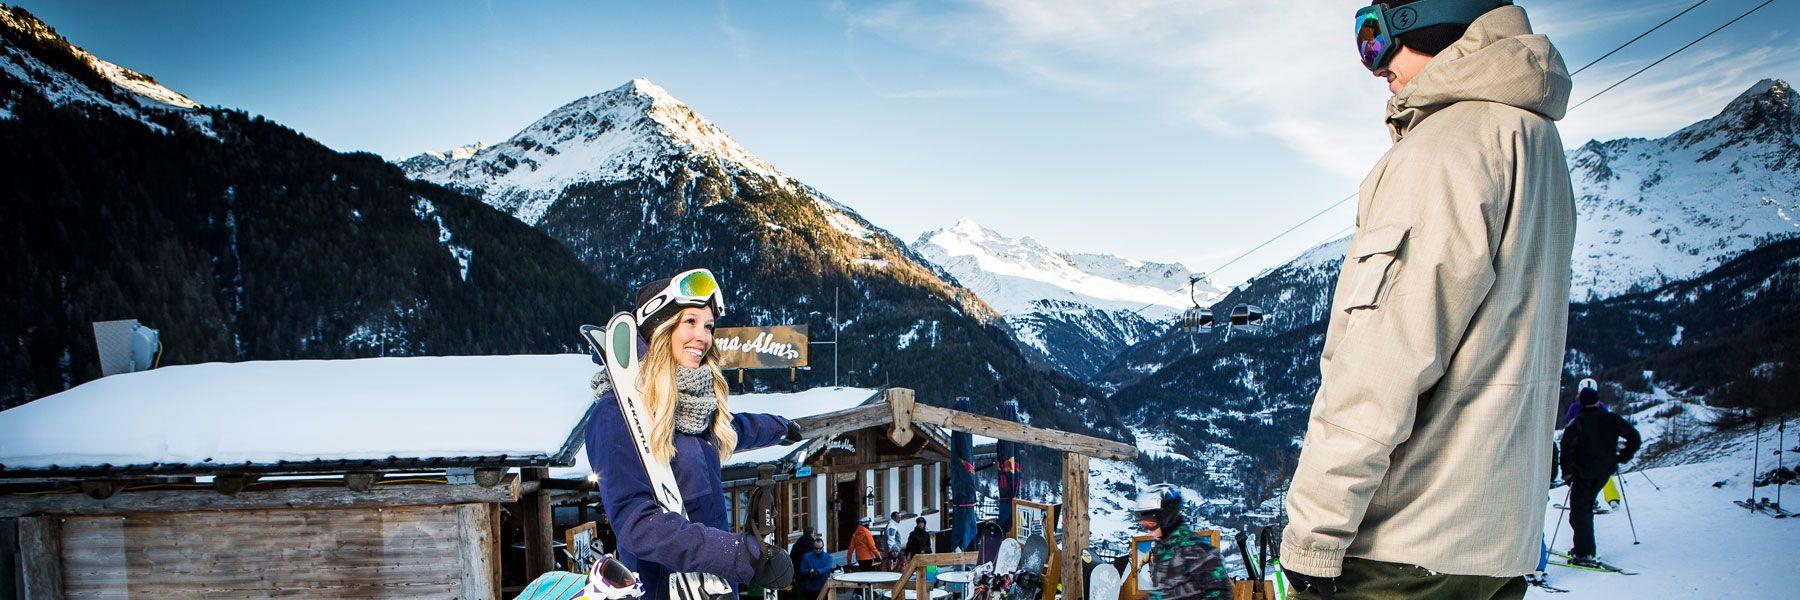 Skispaß in Skigebiet Sölden